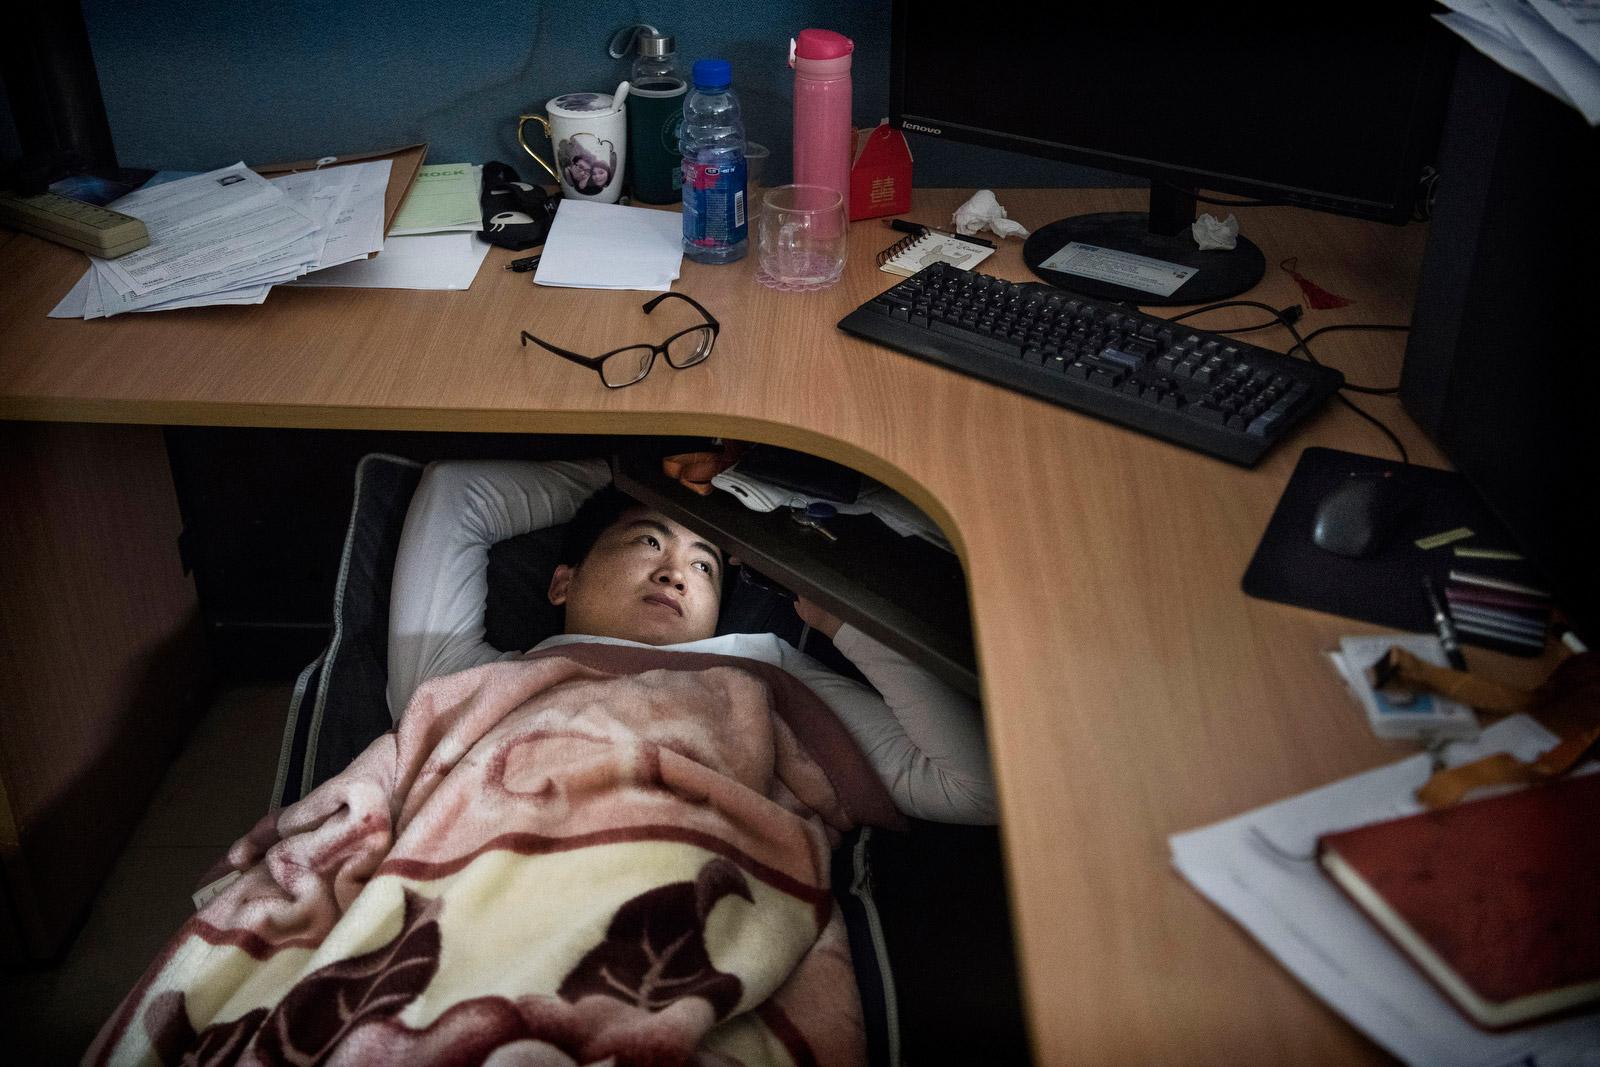 A rare look inside Huawei, China's tech giant